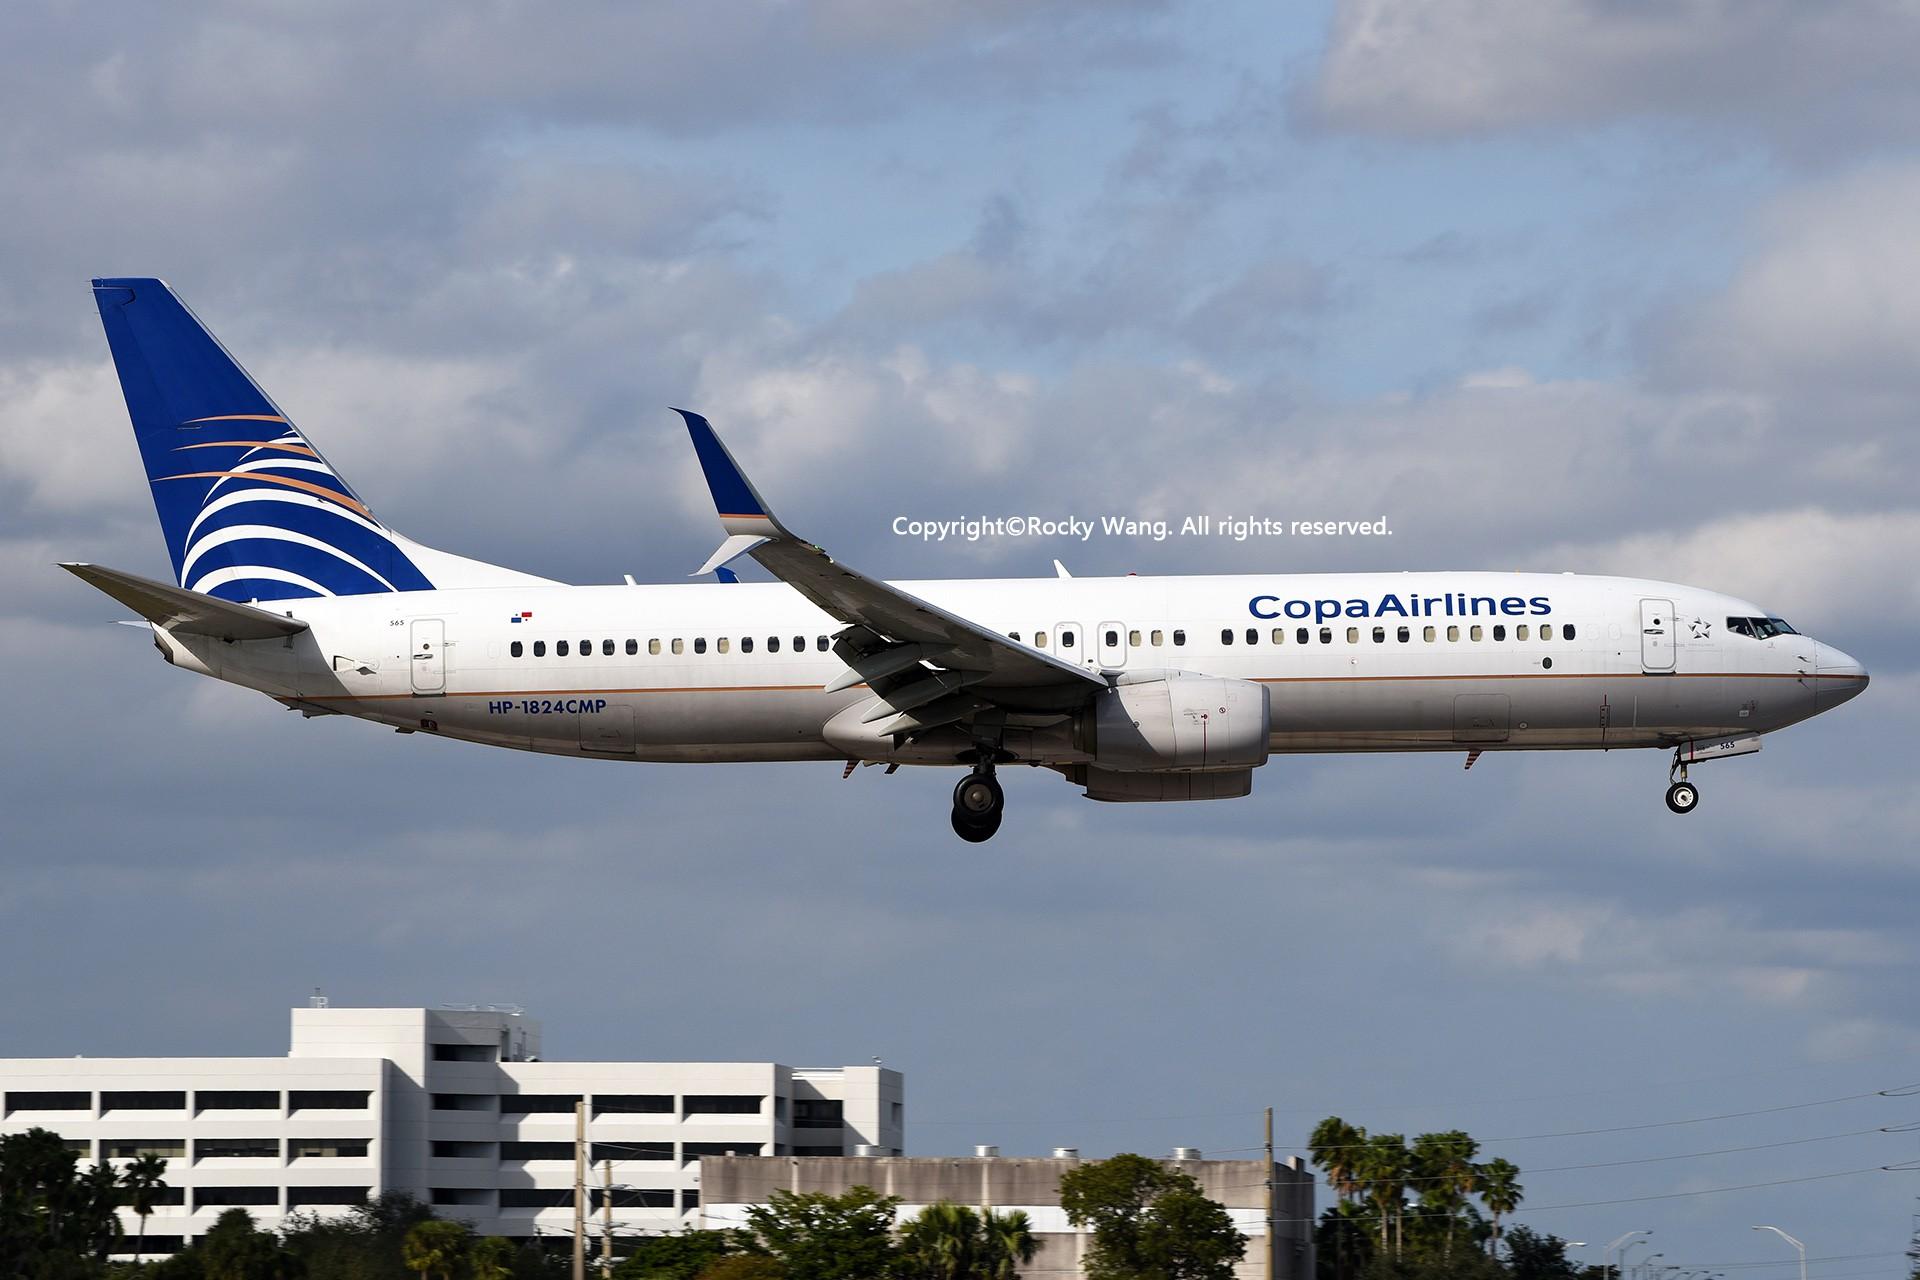 Re:[原创]KMIA 30图 BOEING 737-86N HP-1824CMP Miami Int'l Airport